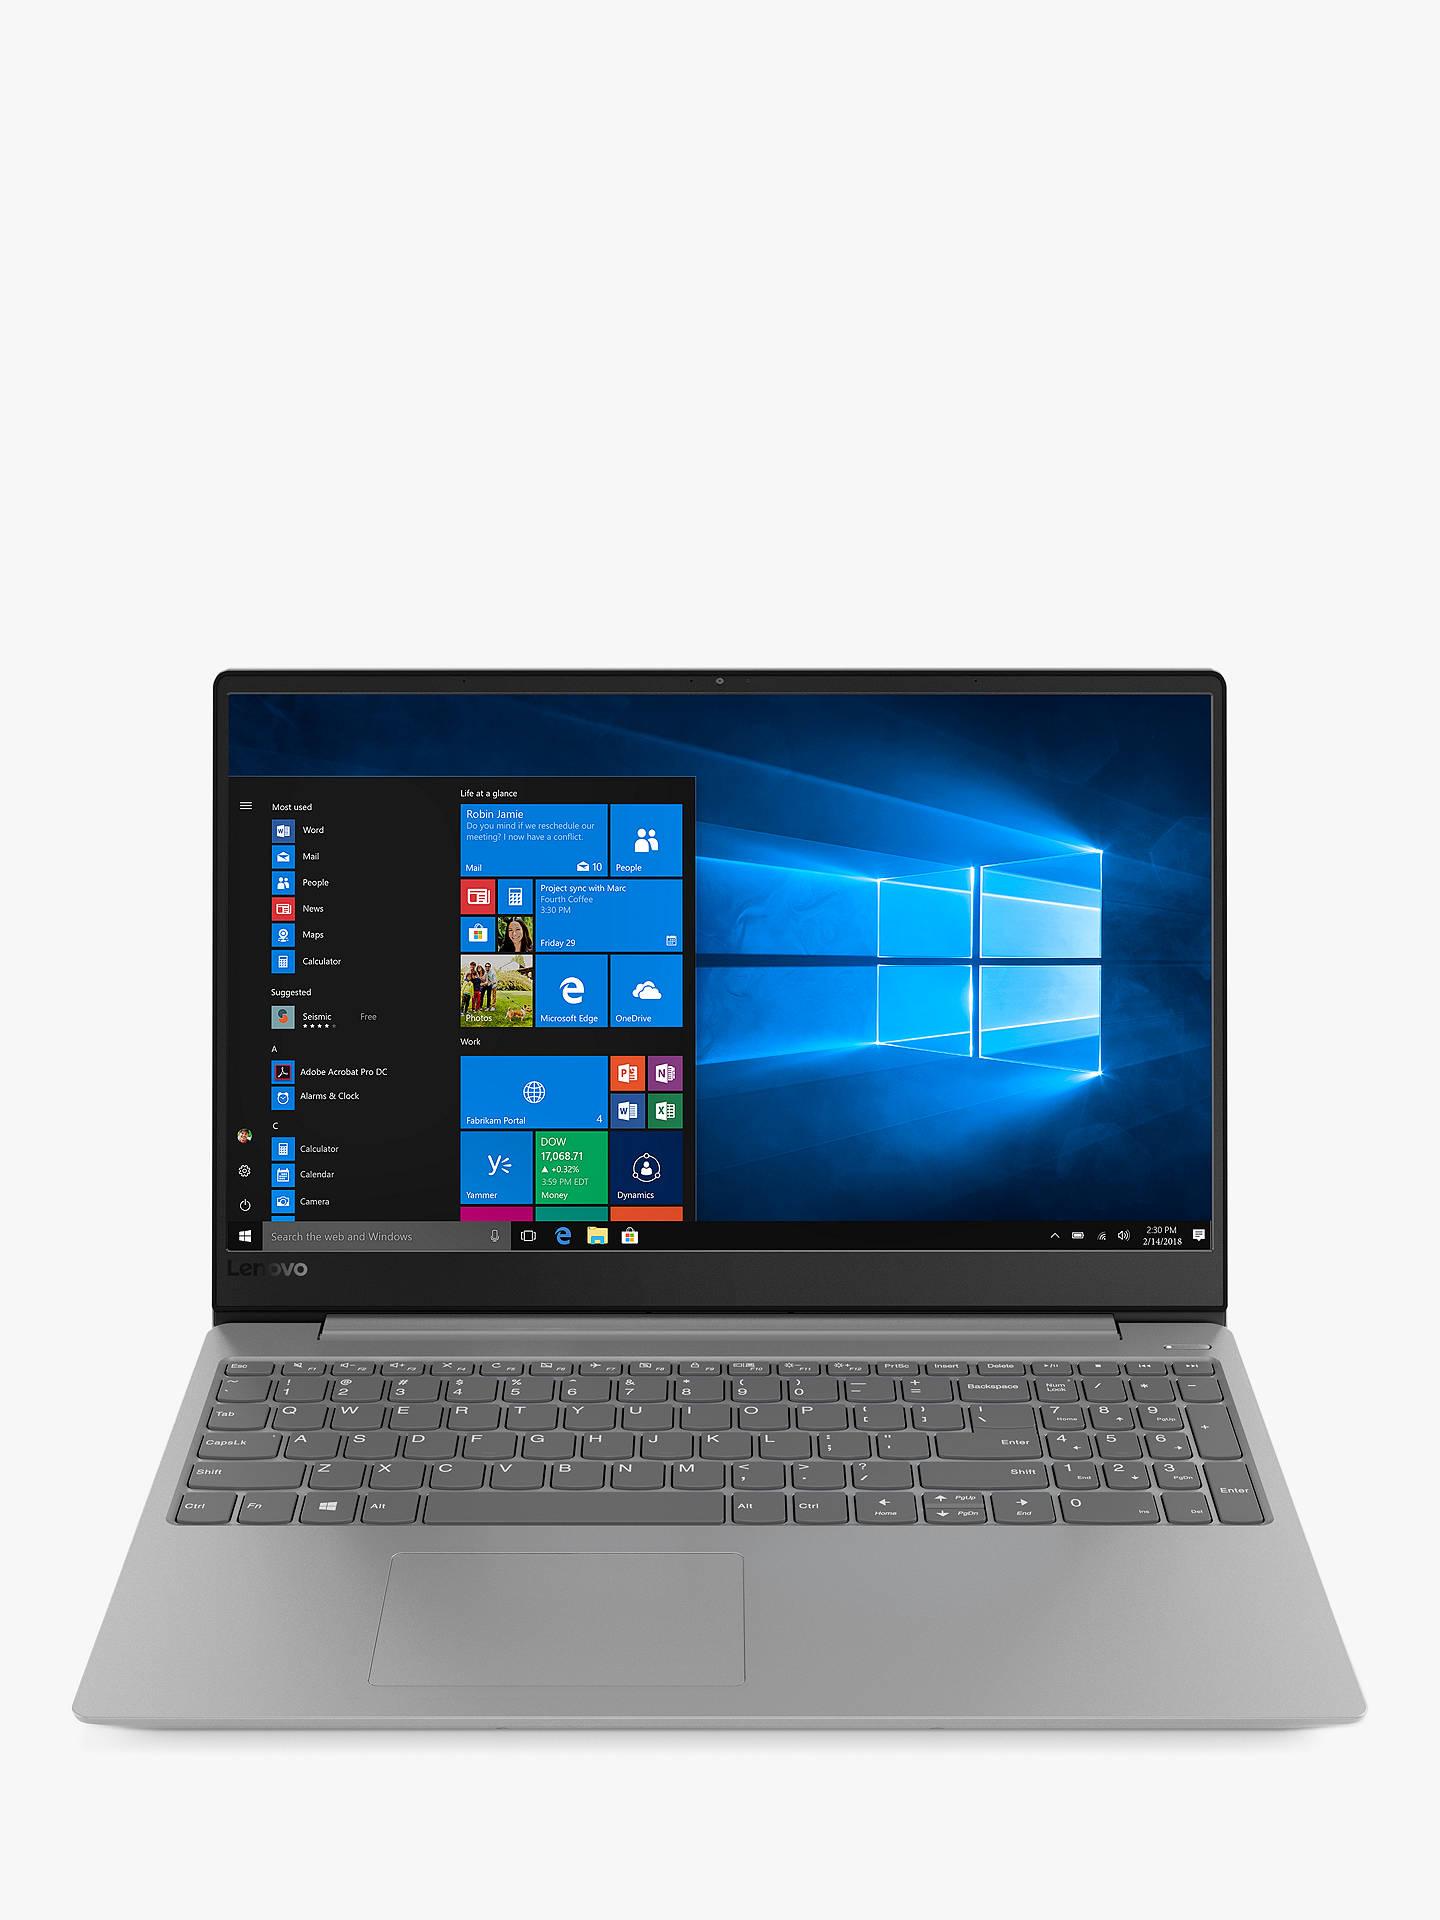 Lenovo IdeaPad 330S 81FB00DCUK Laptop, AMD Ryzen R3 Processor, 4GB RAM,  128GB SSD, 15 6